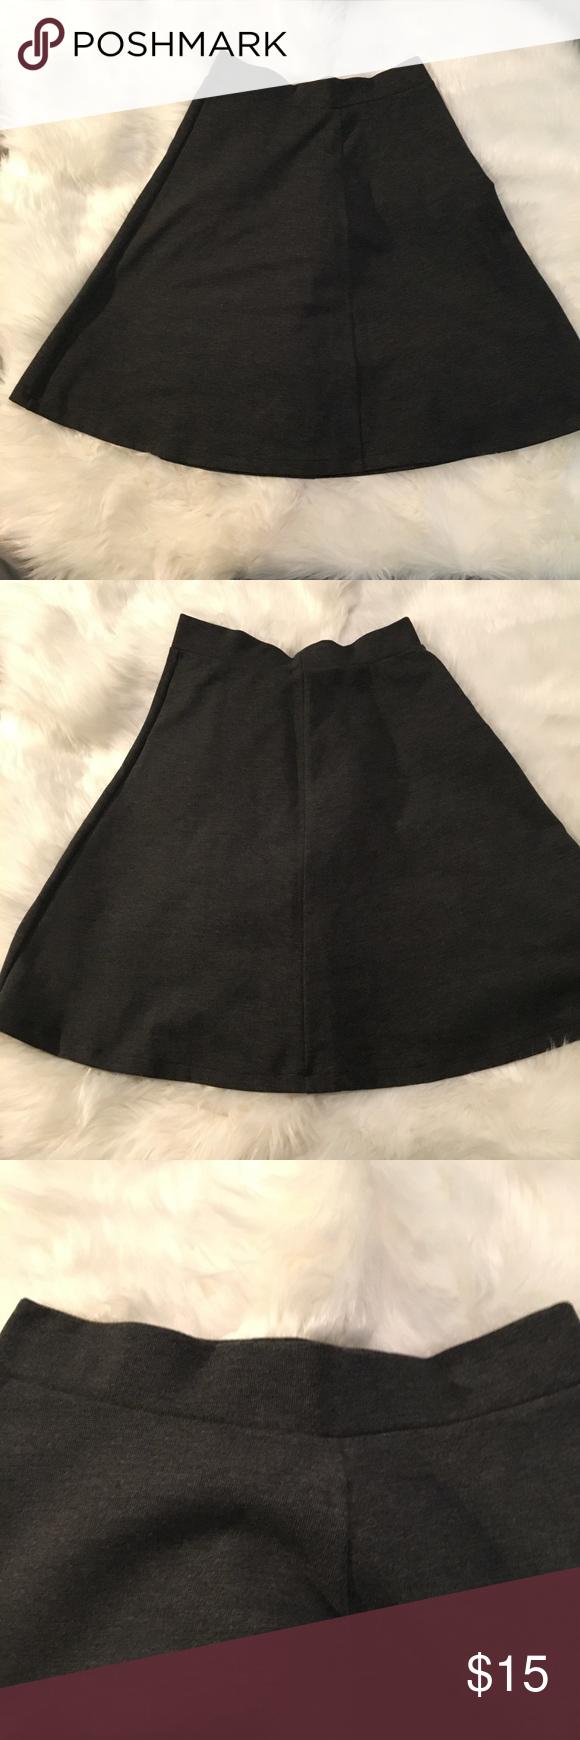 for uniqlo circular skirt charcoal gray uniqlo skirts